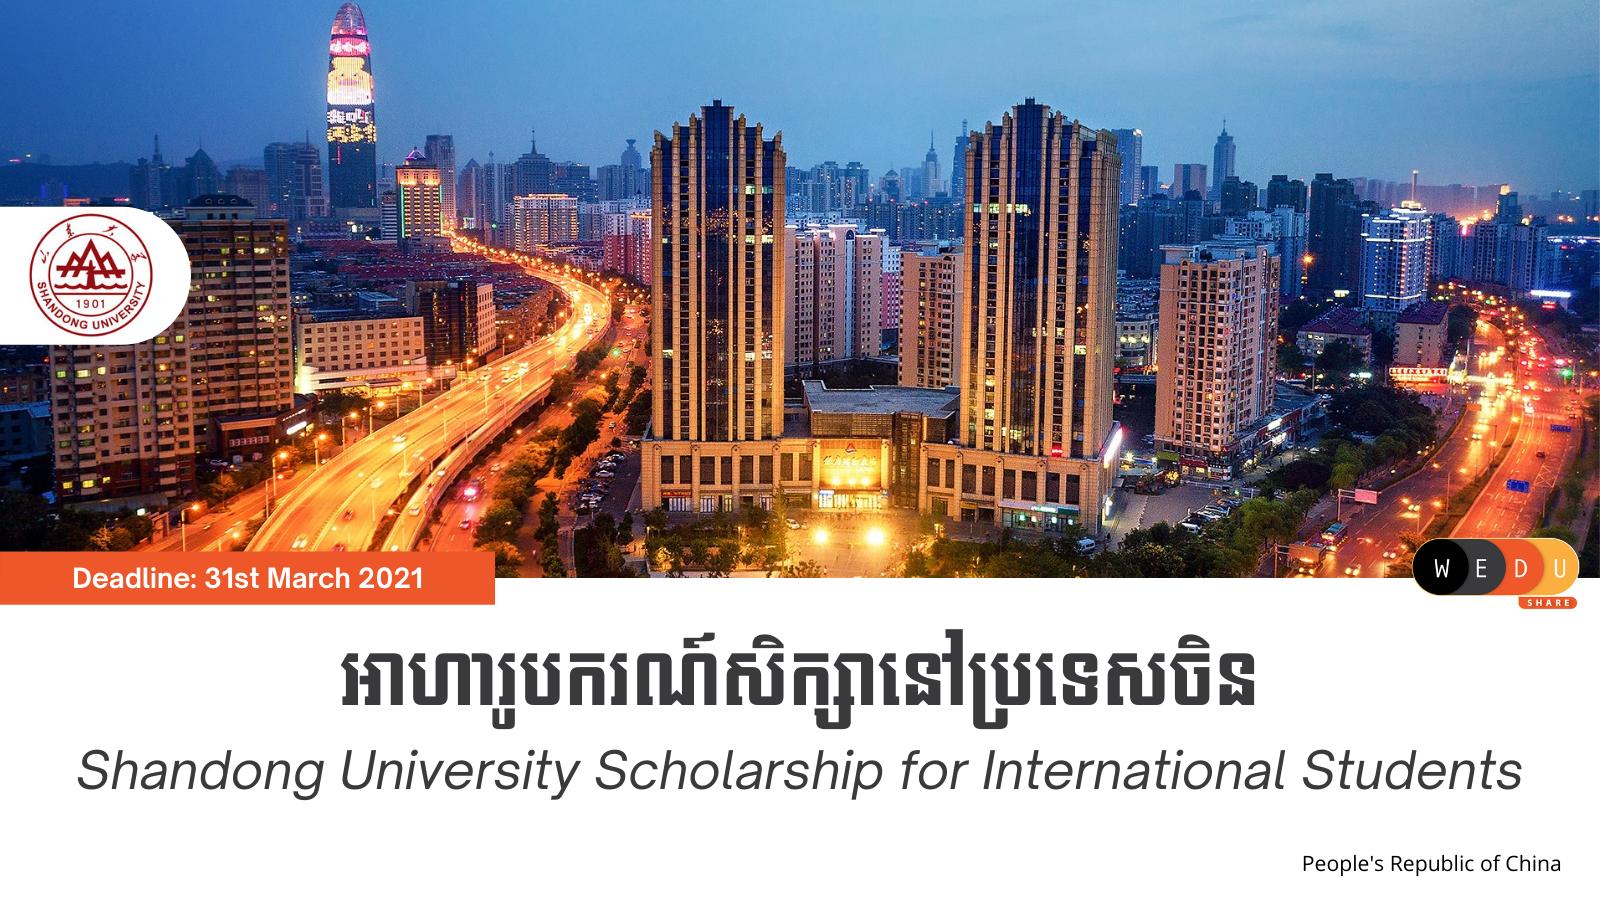 Shandong University Scholarship for International Students